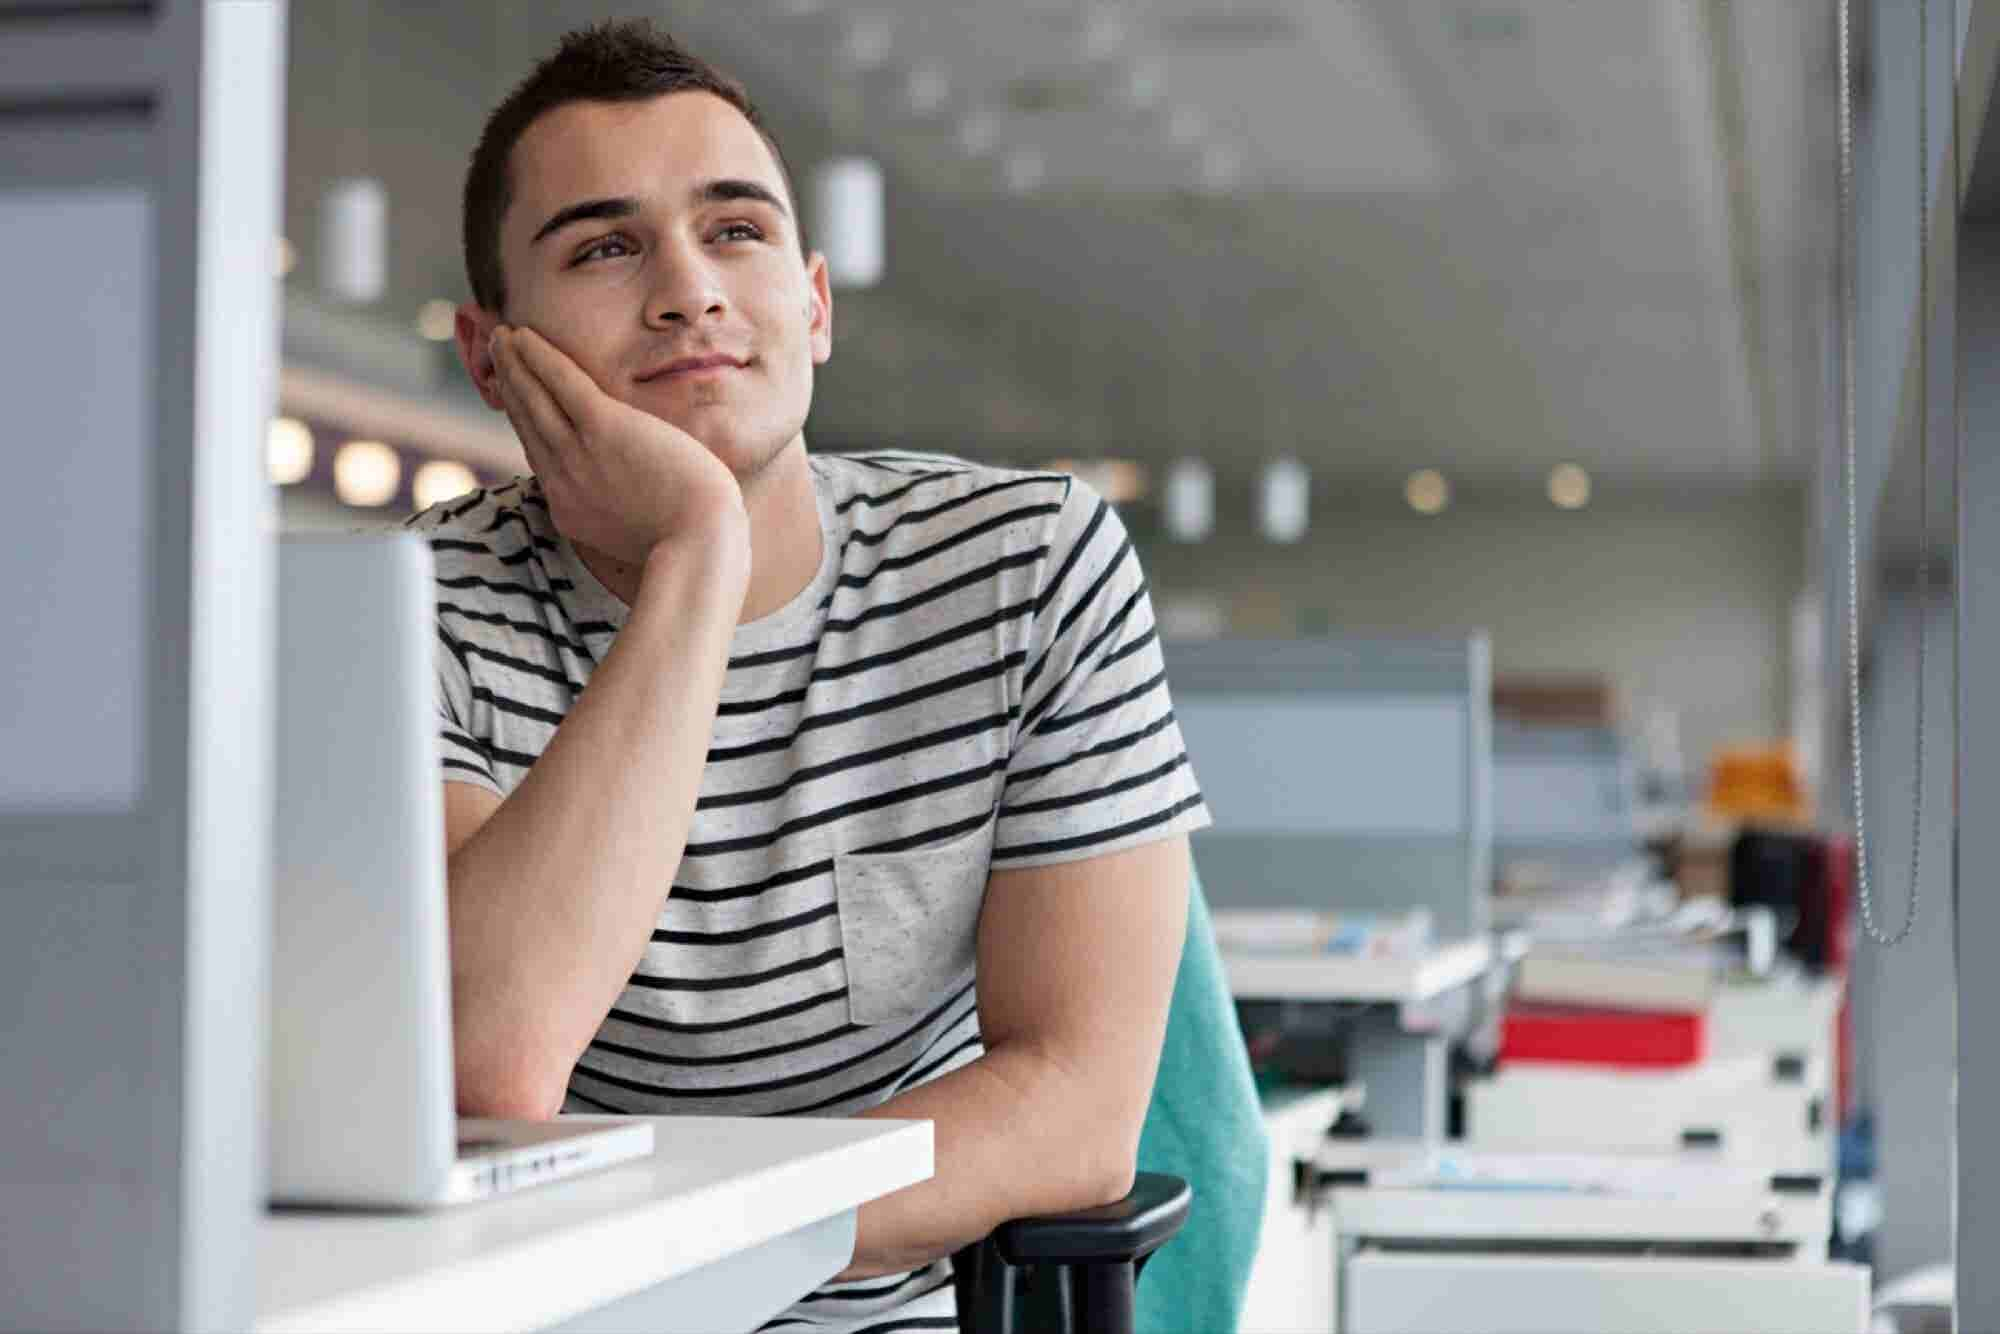 Procrastination or Contemplation? Why Procrastinators Will Rule the Business World.